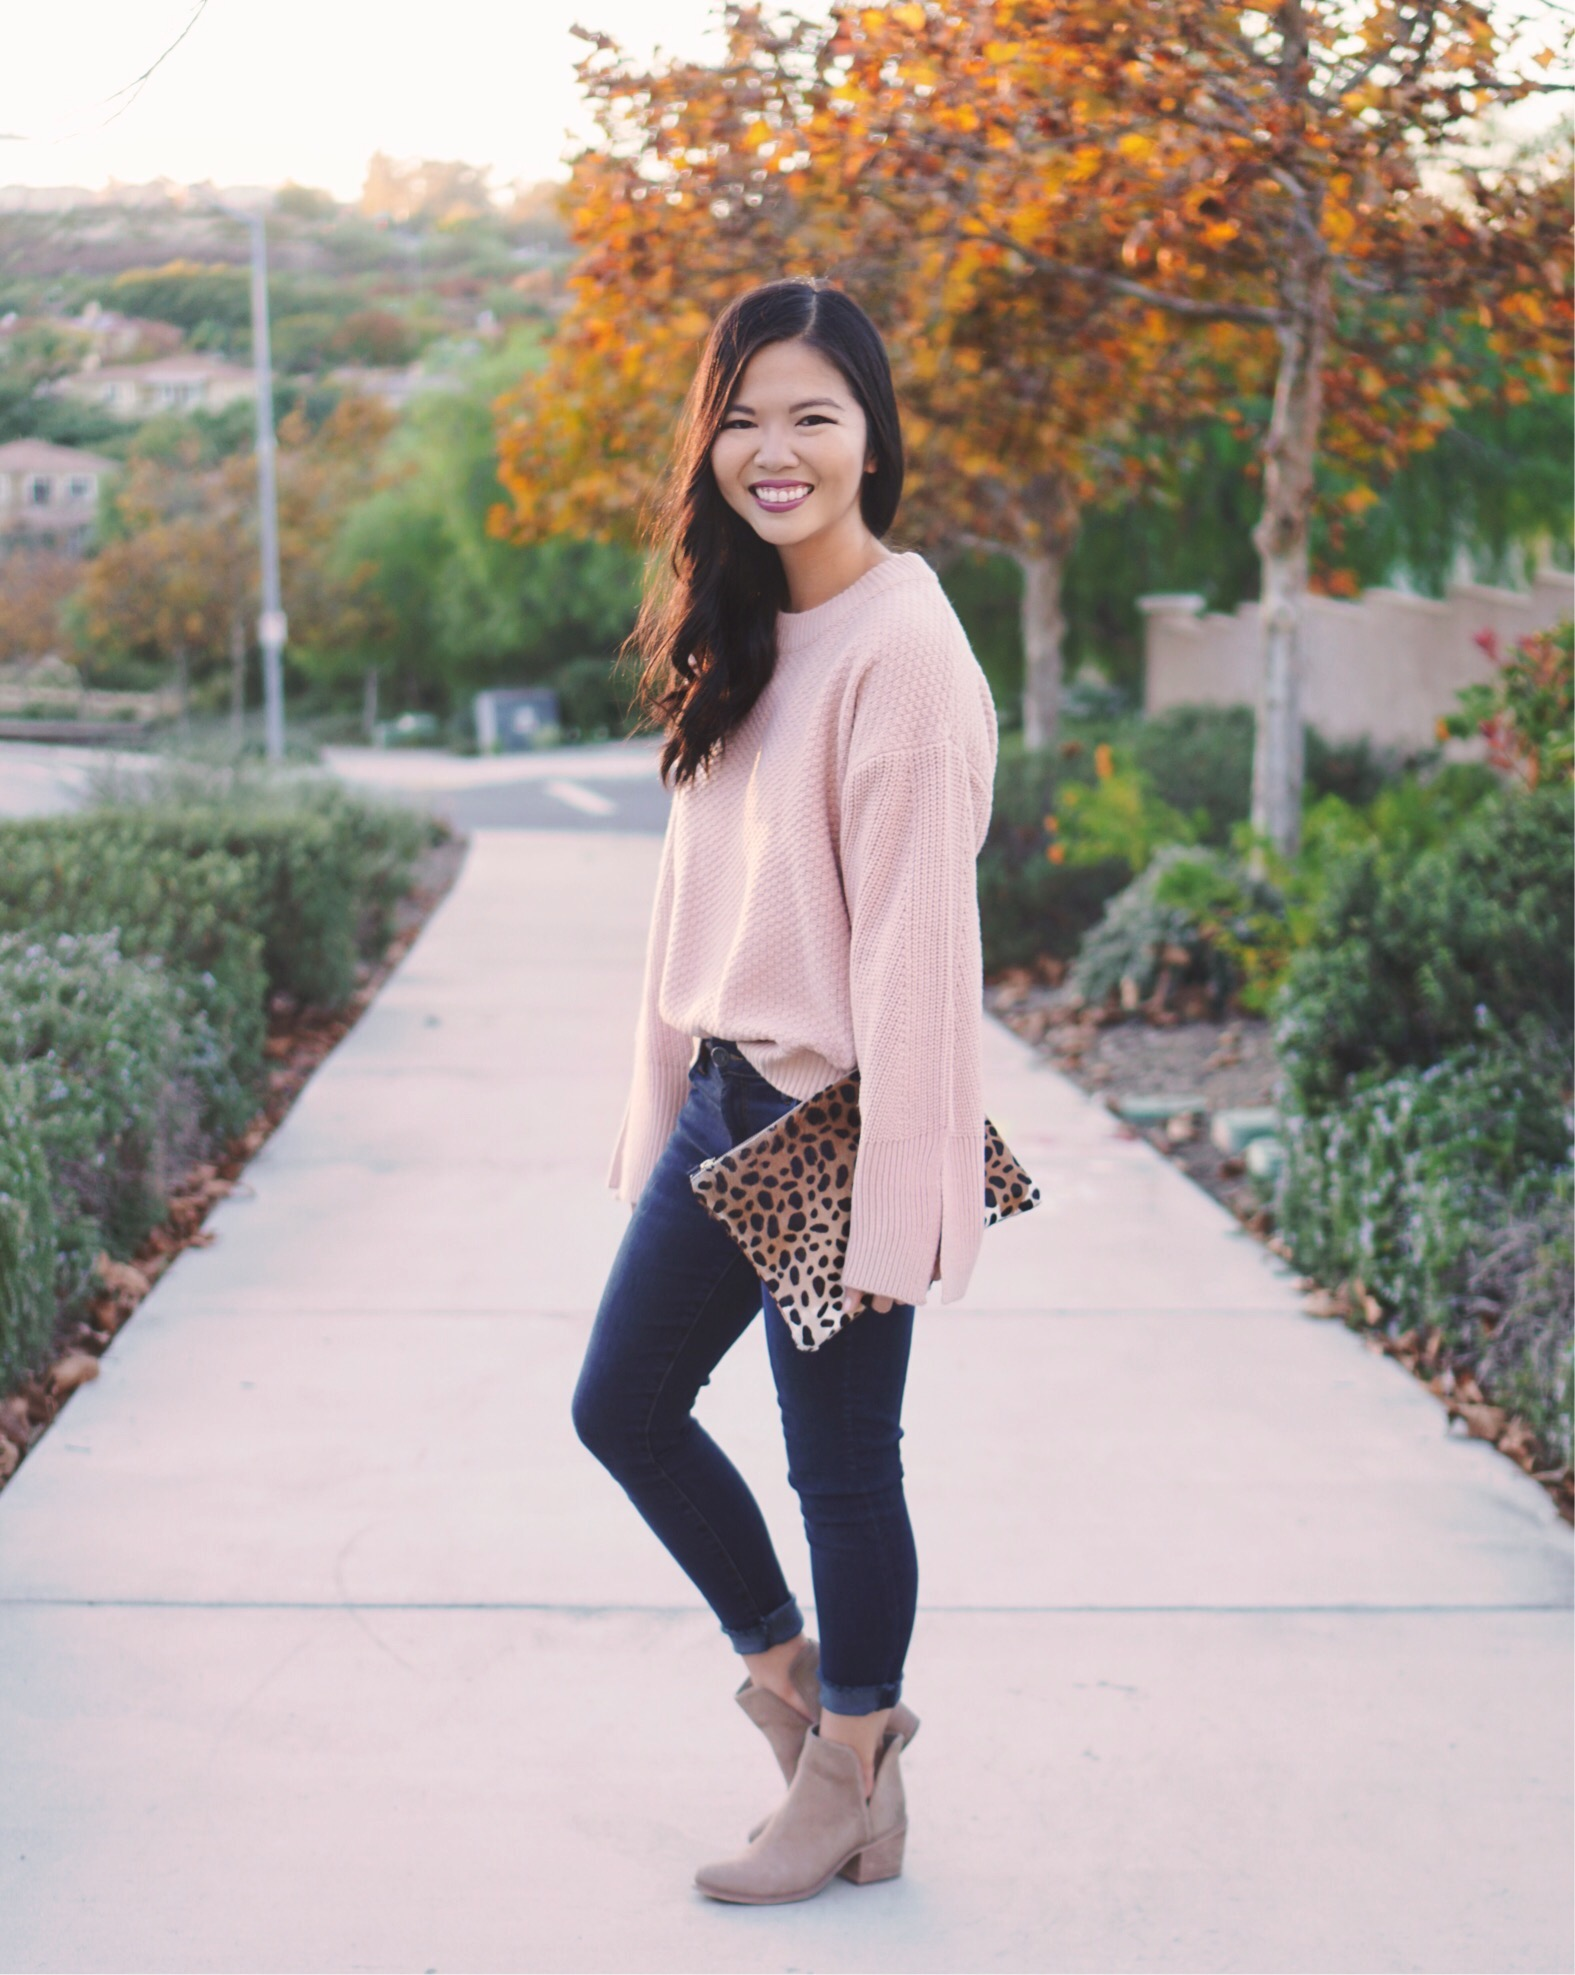 Pink Bellsleeve Sweater & Skinny Jeans